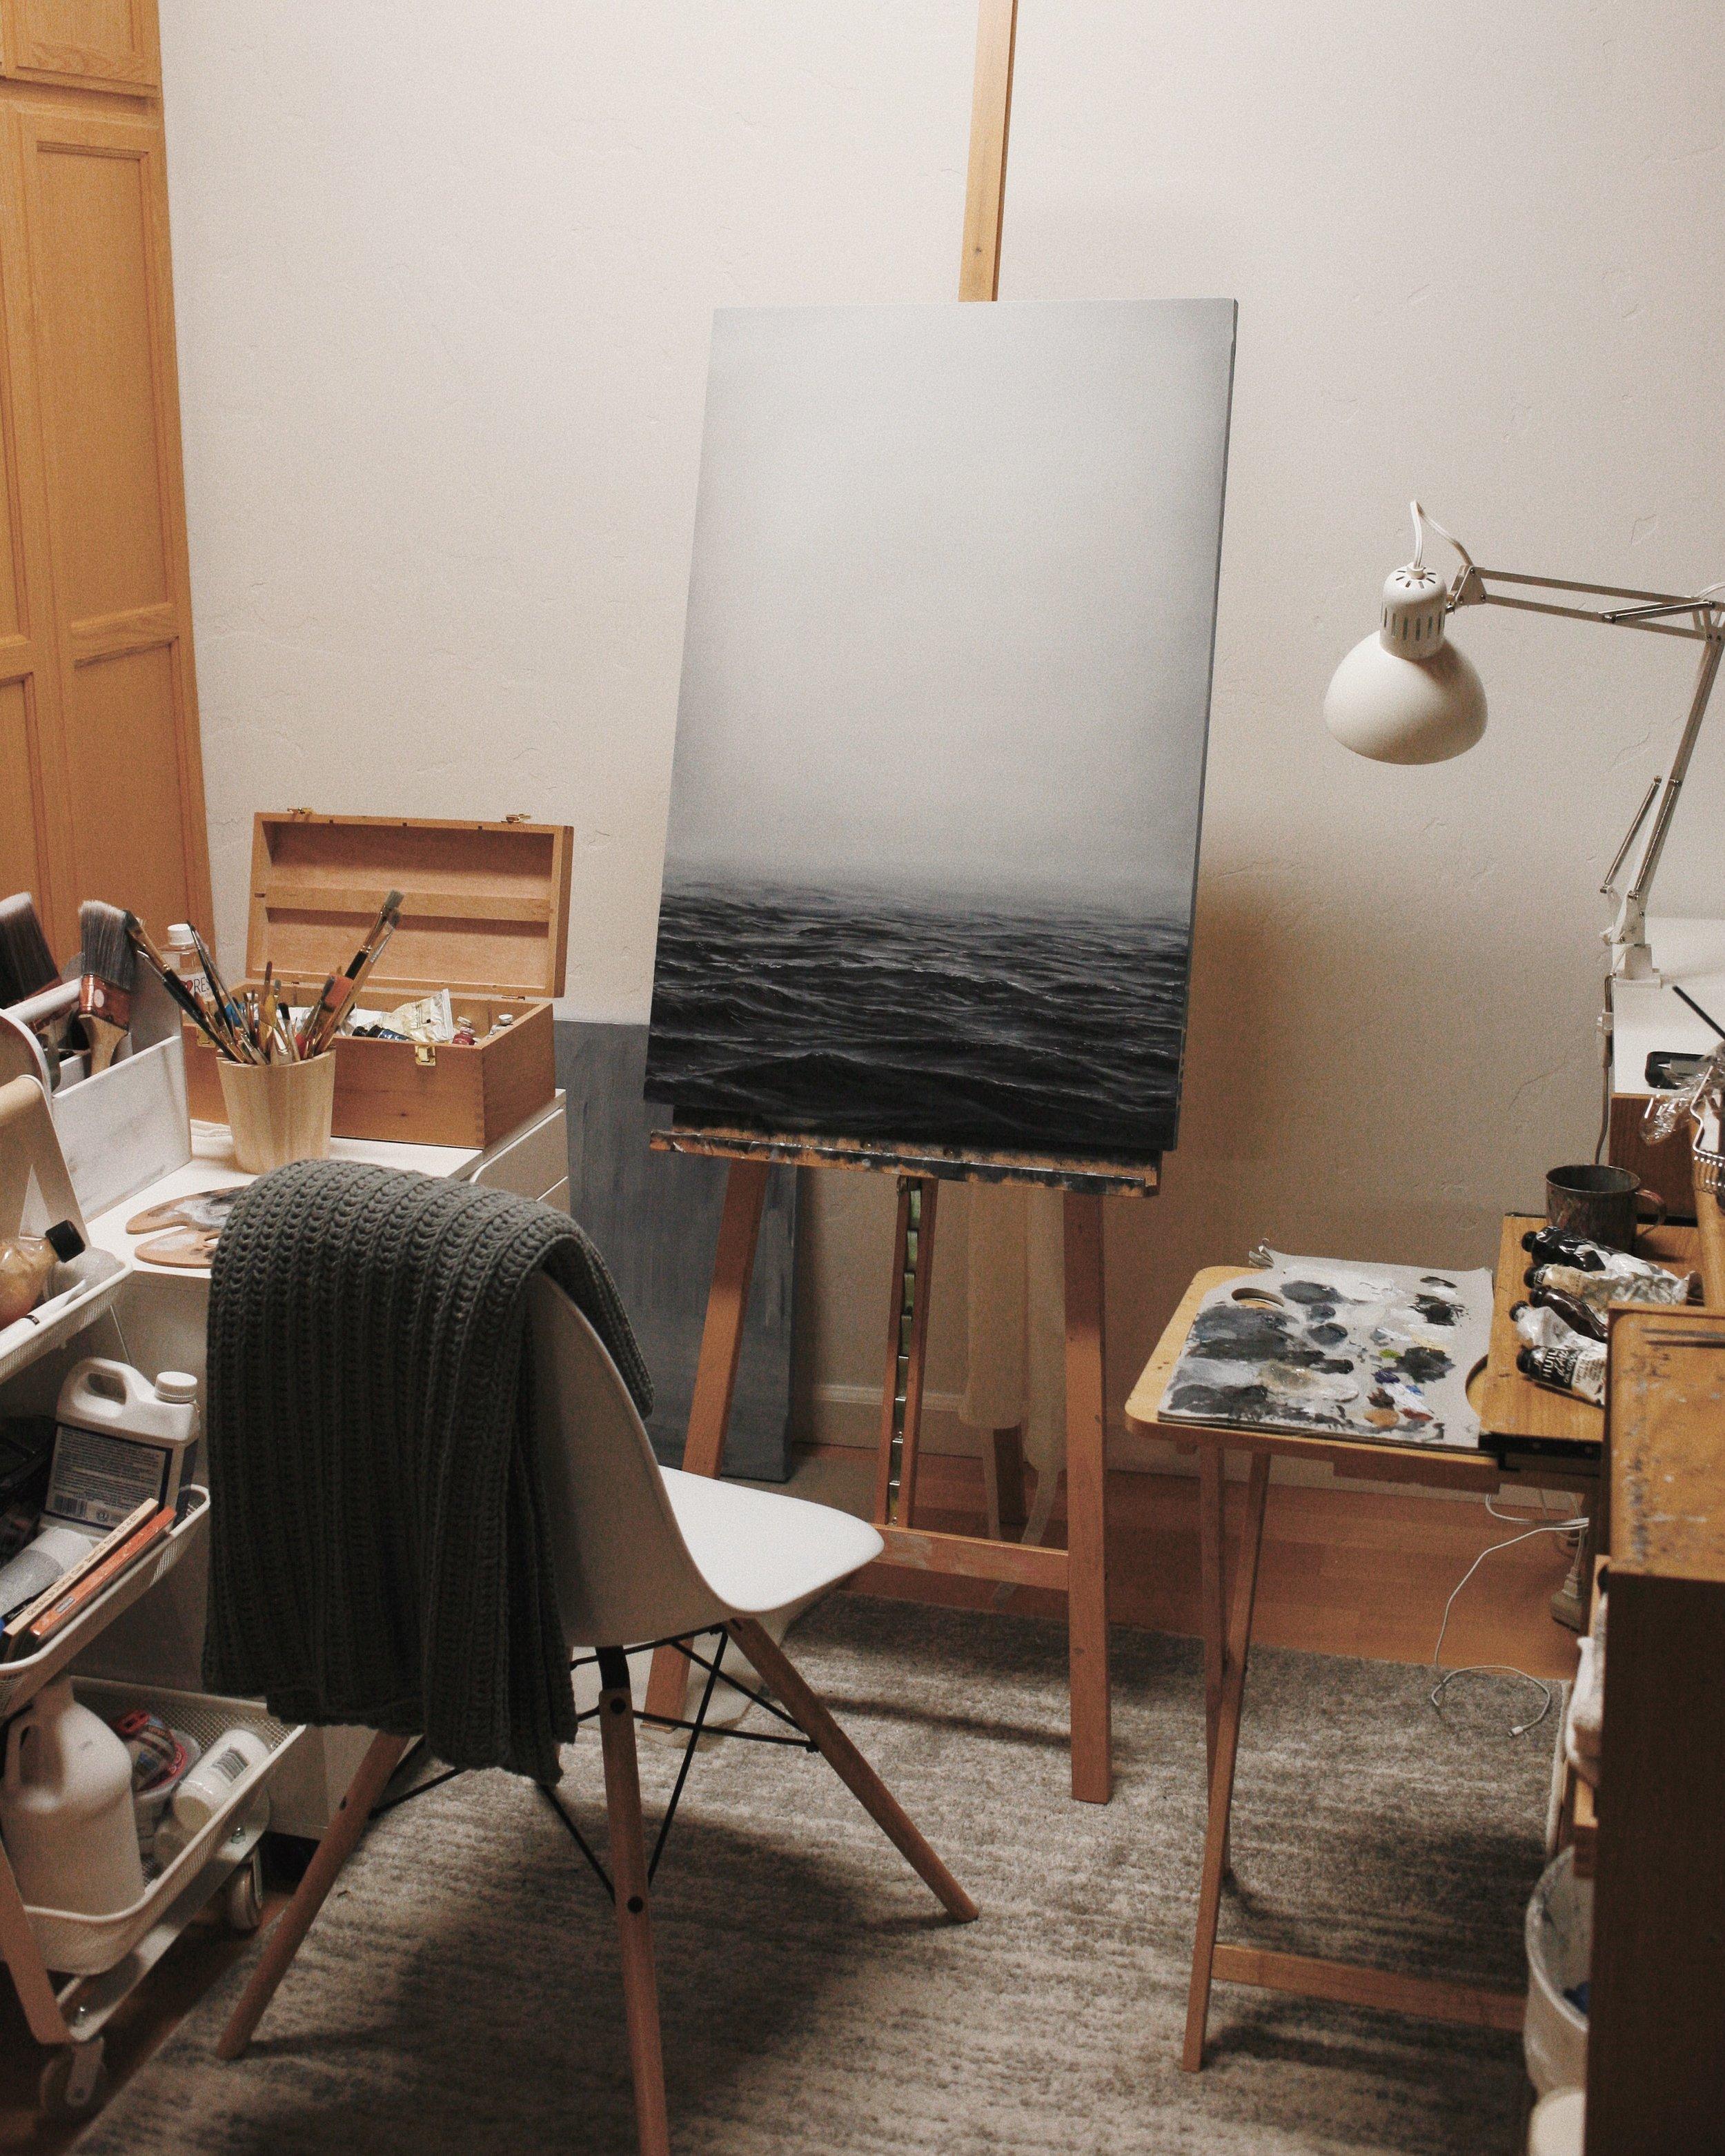 solitude - oil on wood panel - Post Ranch Inn Mercantile - Beau Bernier Frank